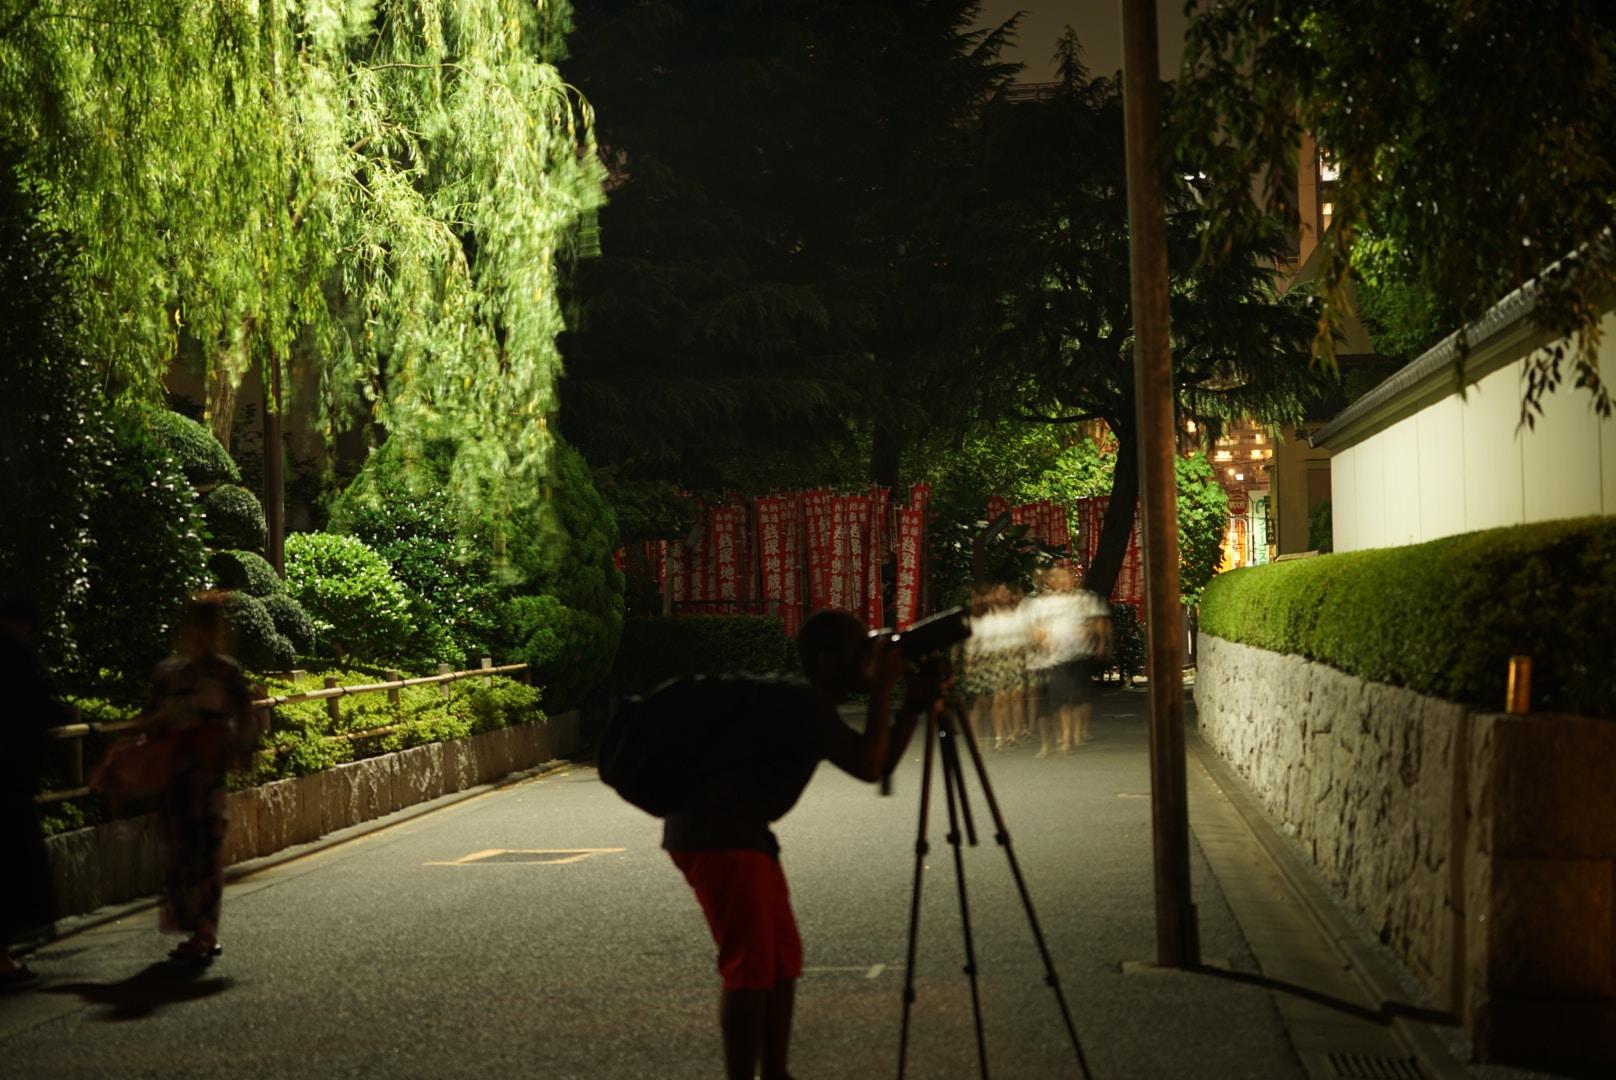 Go to amandaziphotography's profile